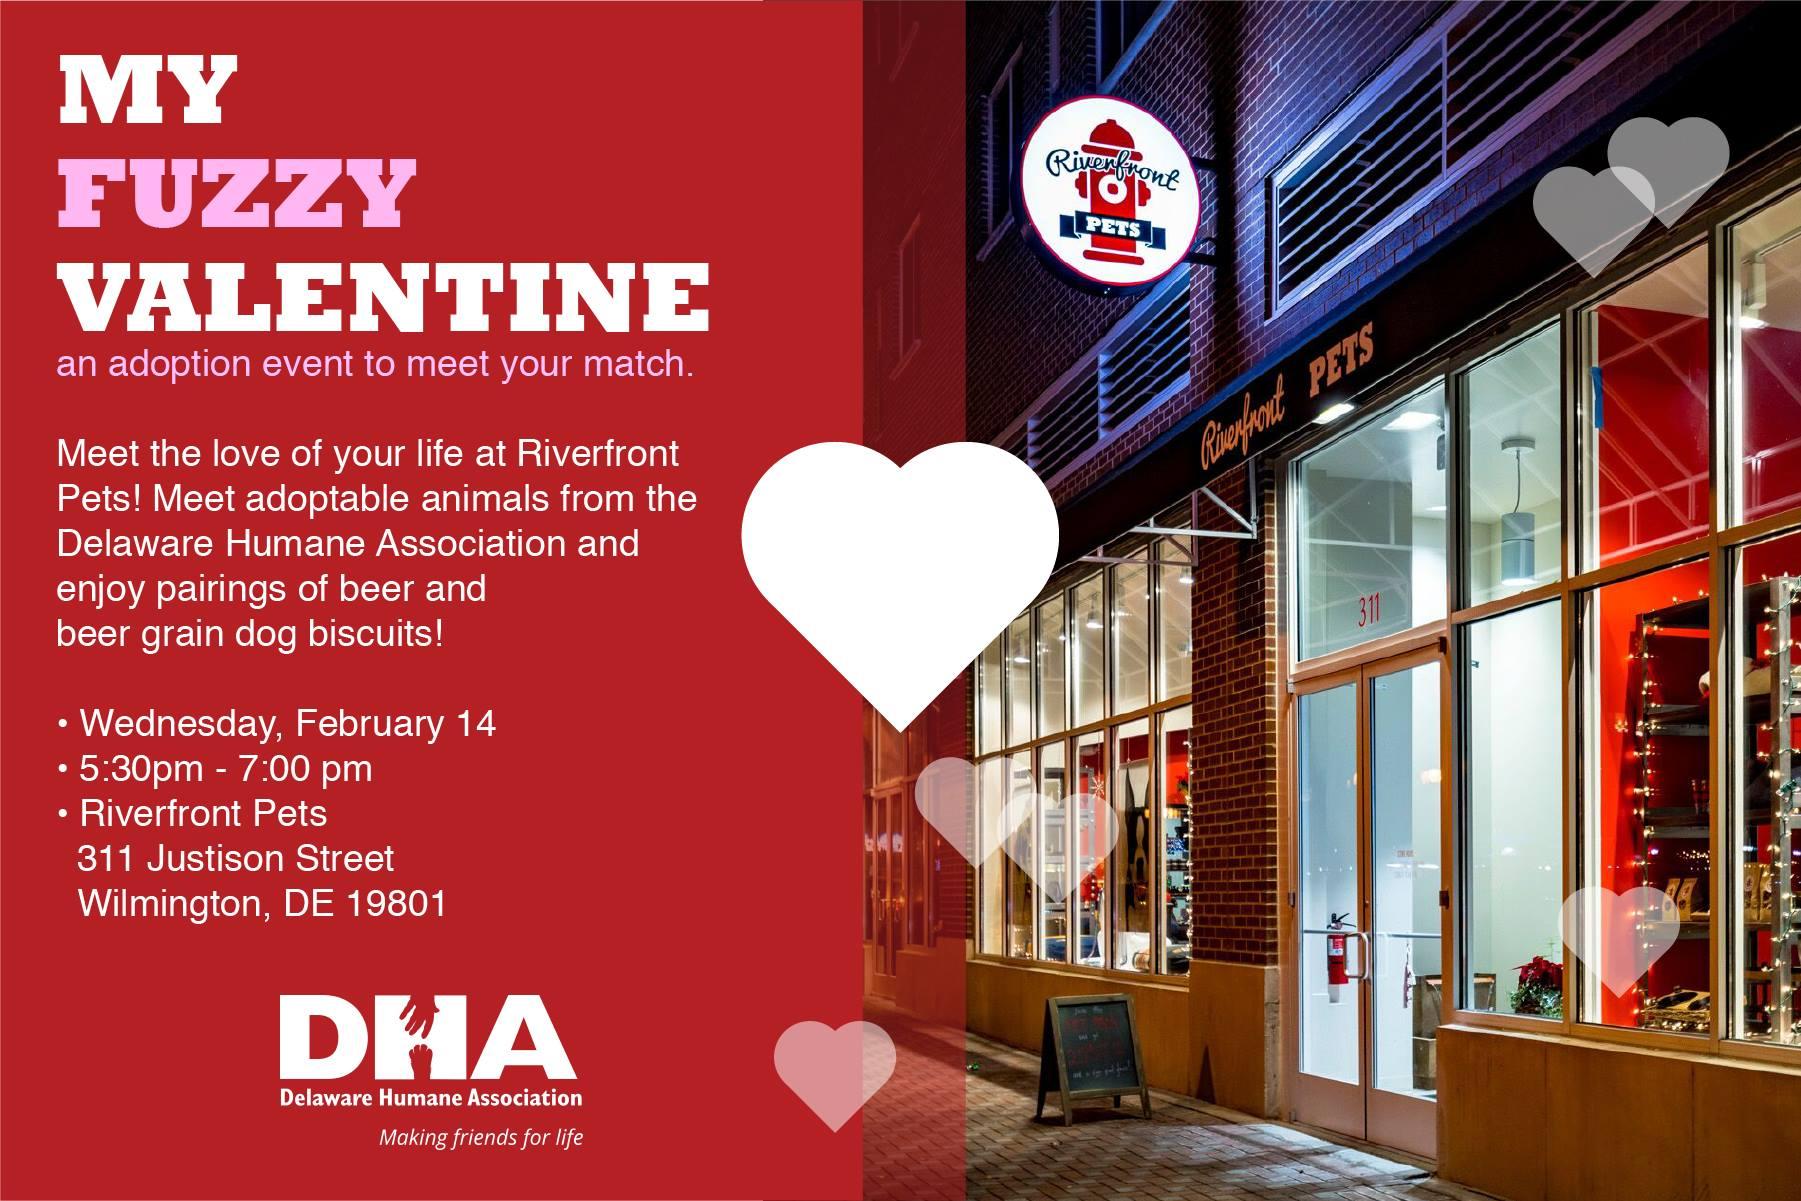 Riverfront Pets' My Fuzzy Valentine Adoption Event